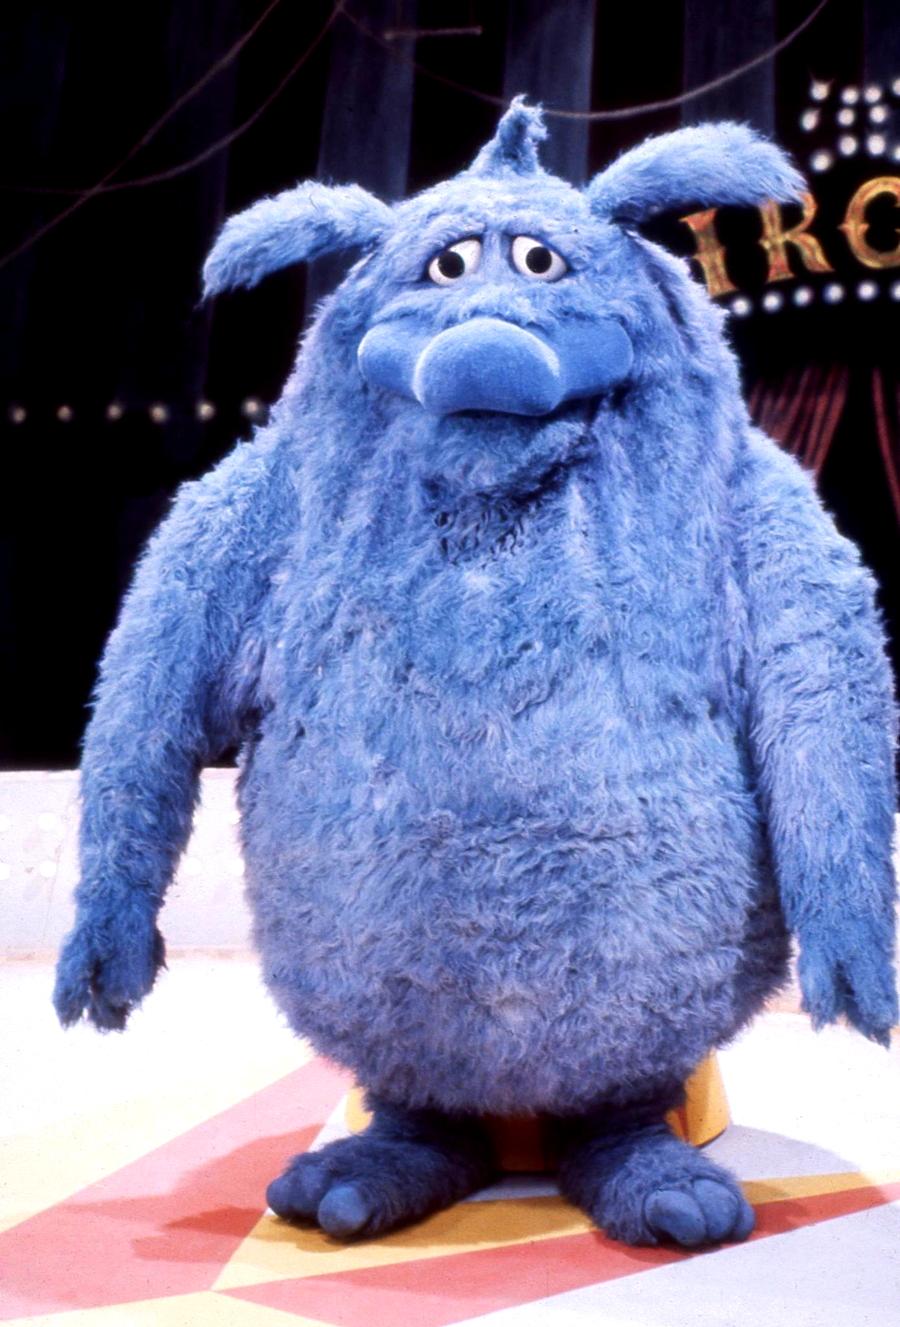 Thog | Muppet Wiki | FANDOM powered by Wikia